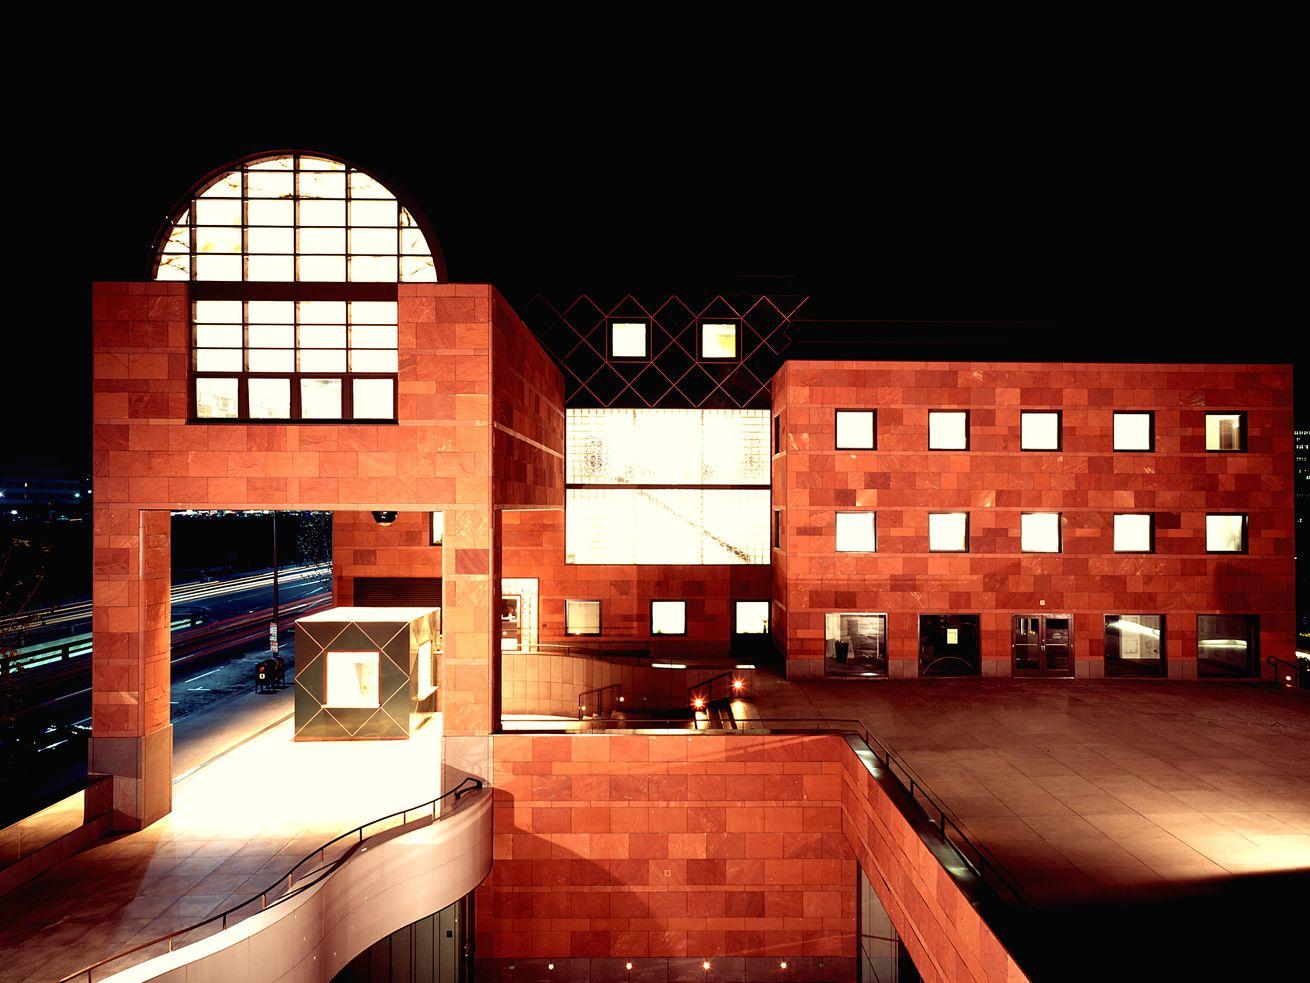 MOCA's glowing geometric forms illuminate Bunker Hill at night.